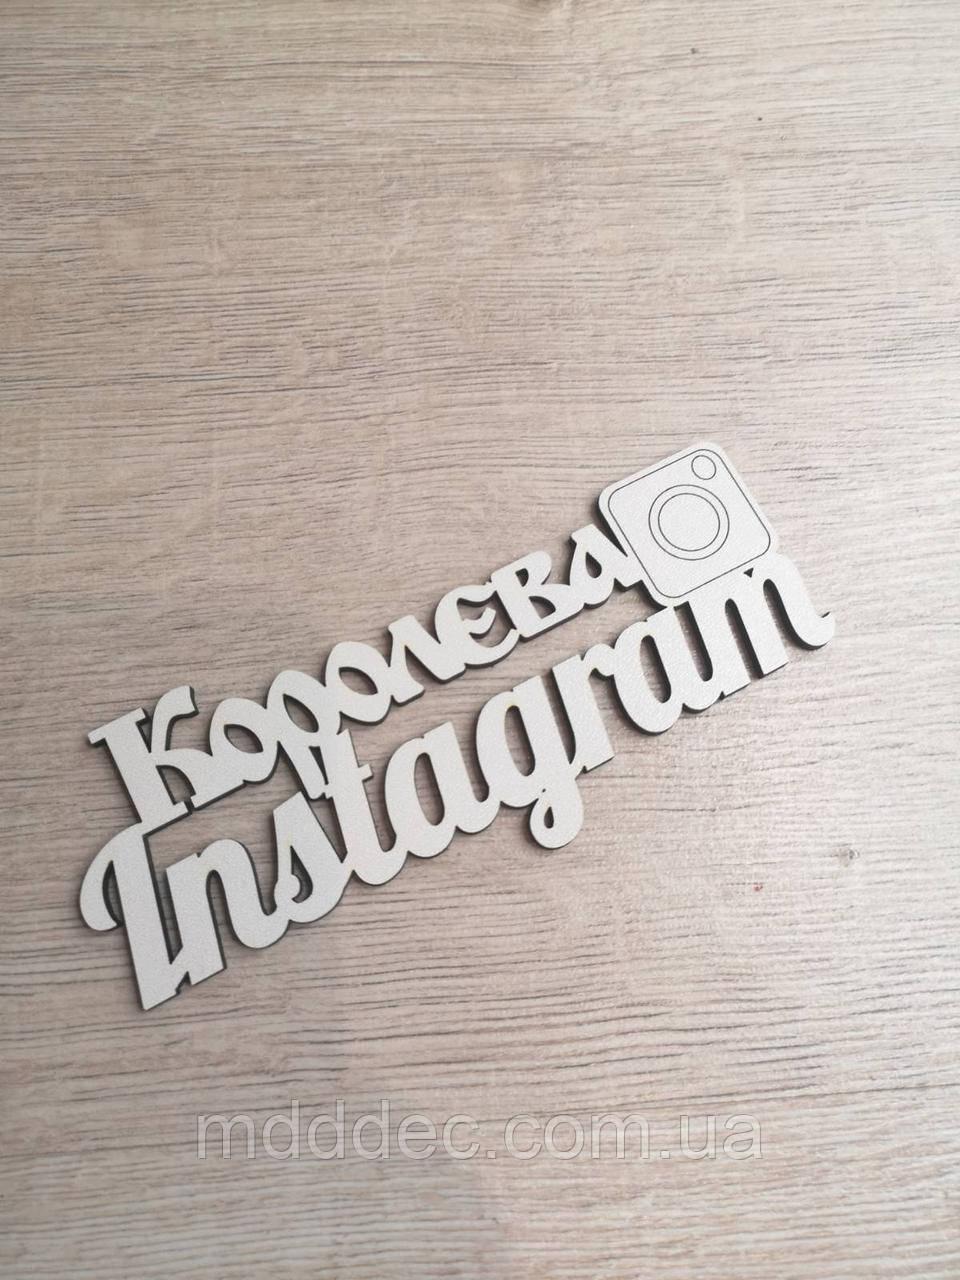 Заготовка под топпер. Слово в коробку Королєва Instagram